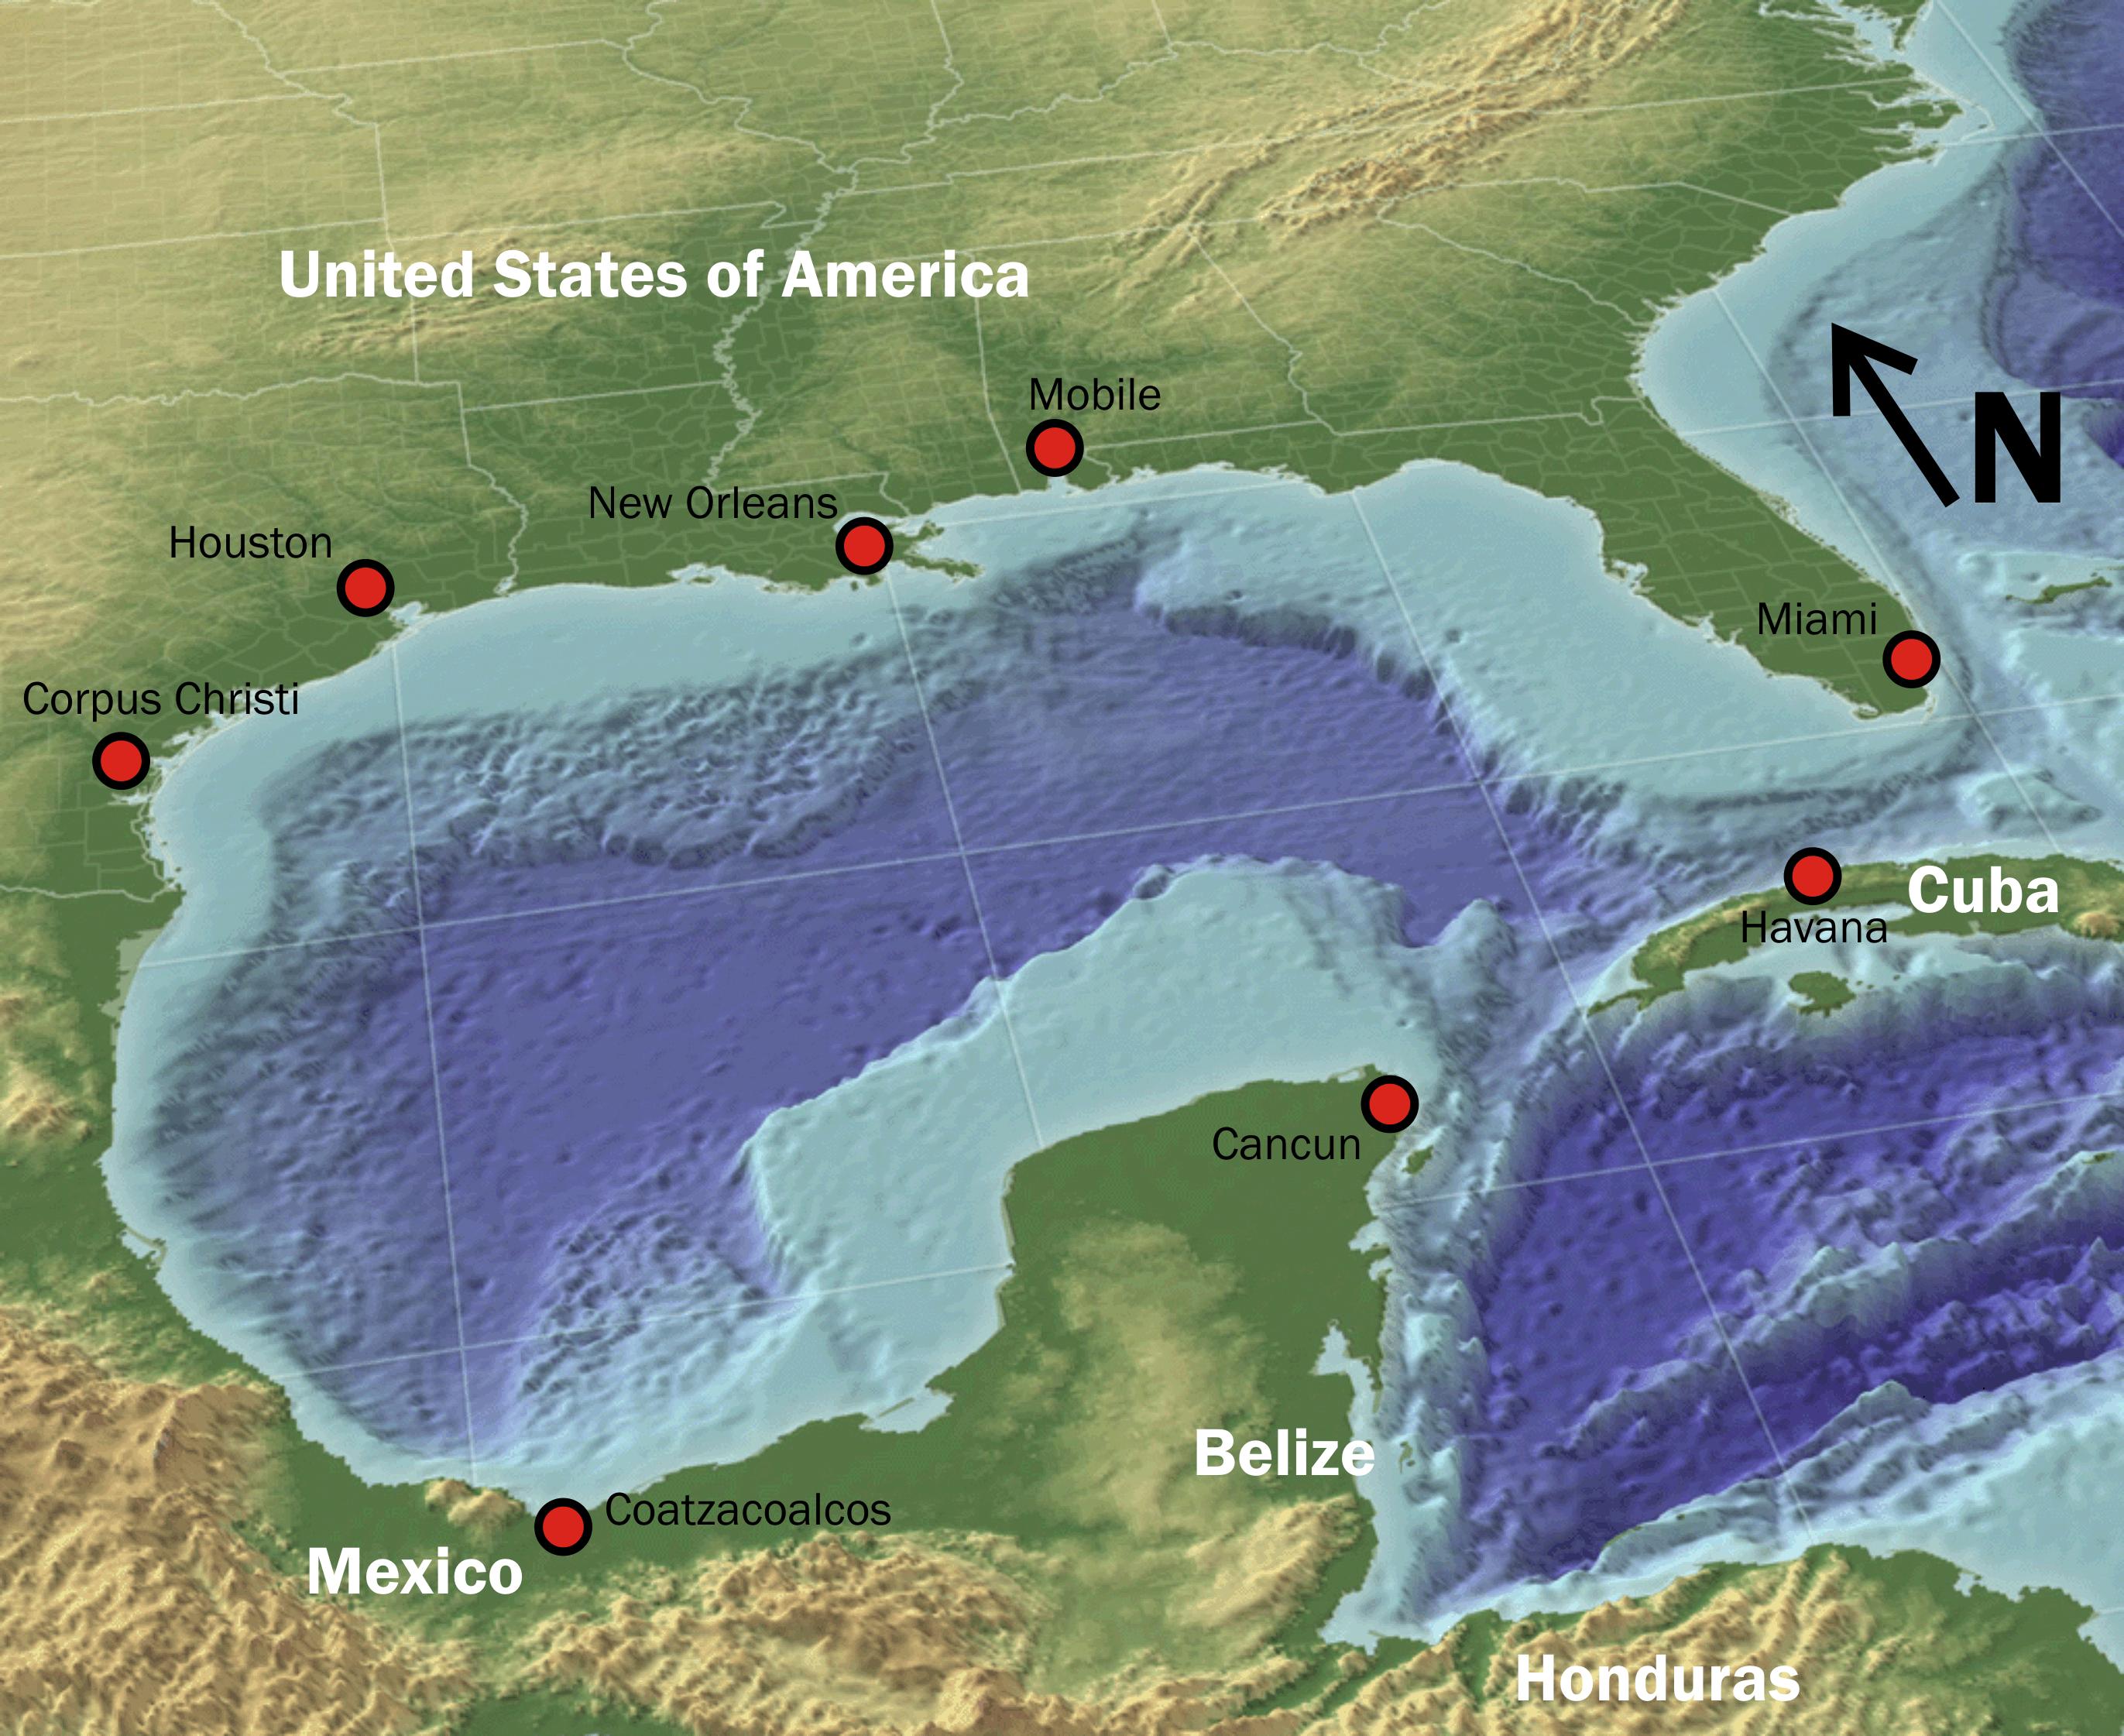 geografia llanura: